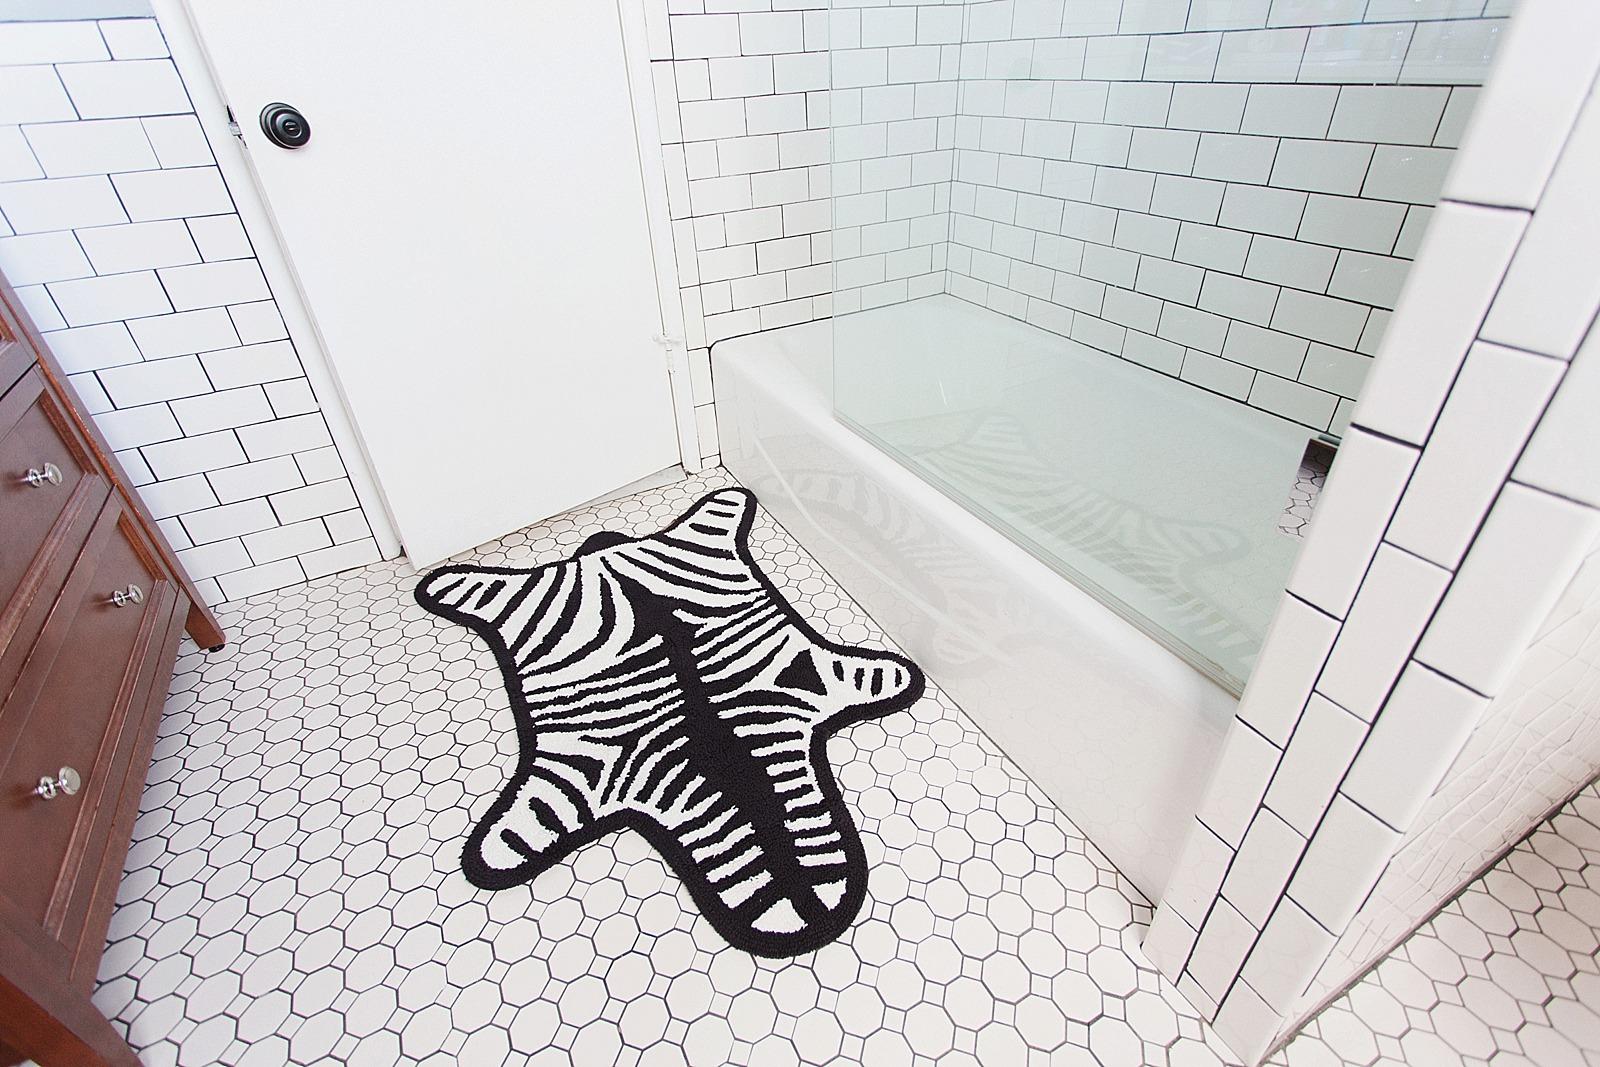 howchow-neiman-marcus-home-diana-elizabeth-blog-phoenix-arizona-lifestyle-blogger-home-bathroom-jonathan-adler-1041